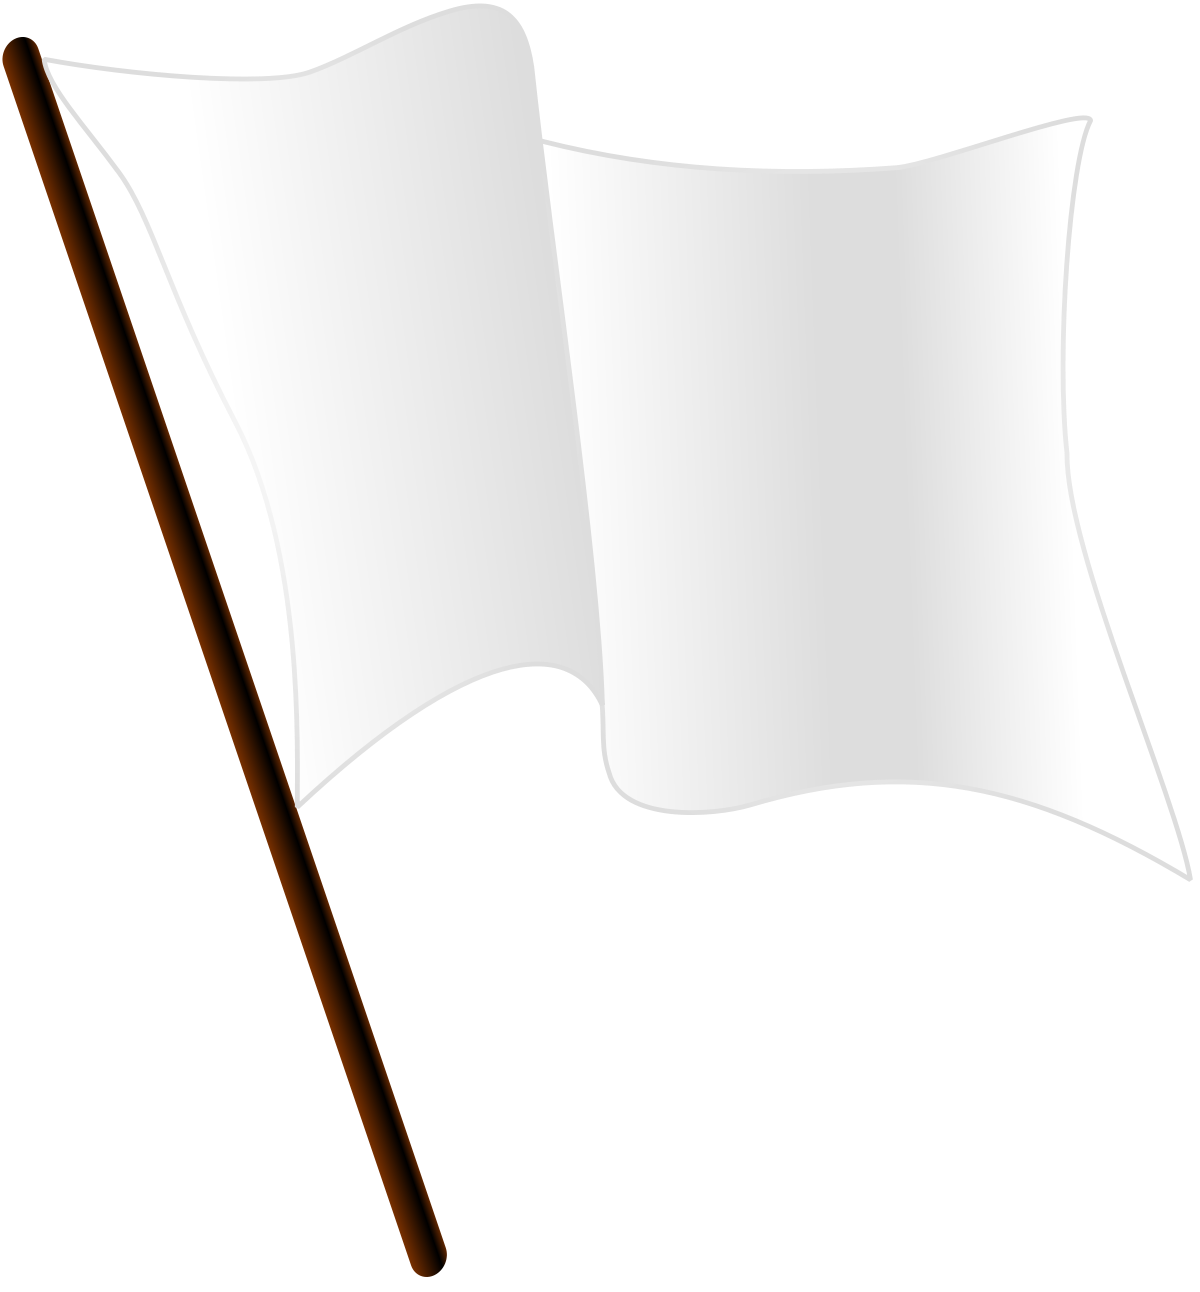 Missions clipart international flag. White wikipedia